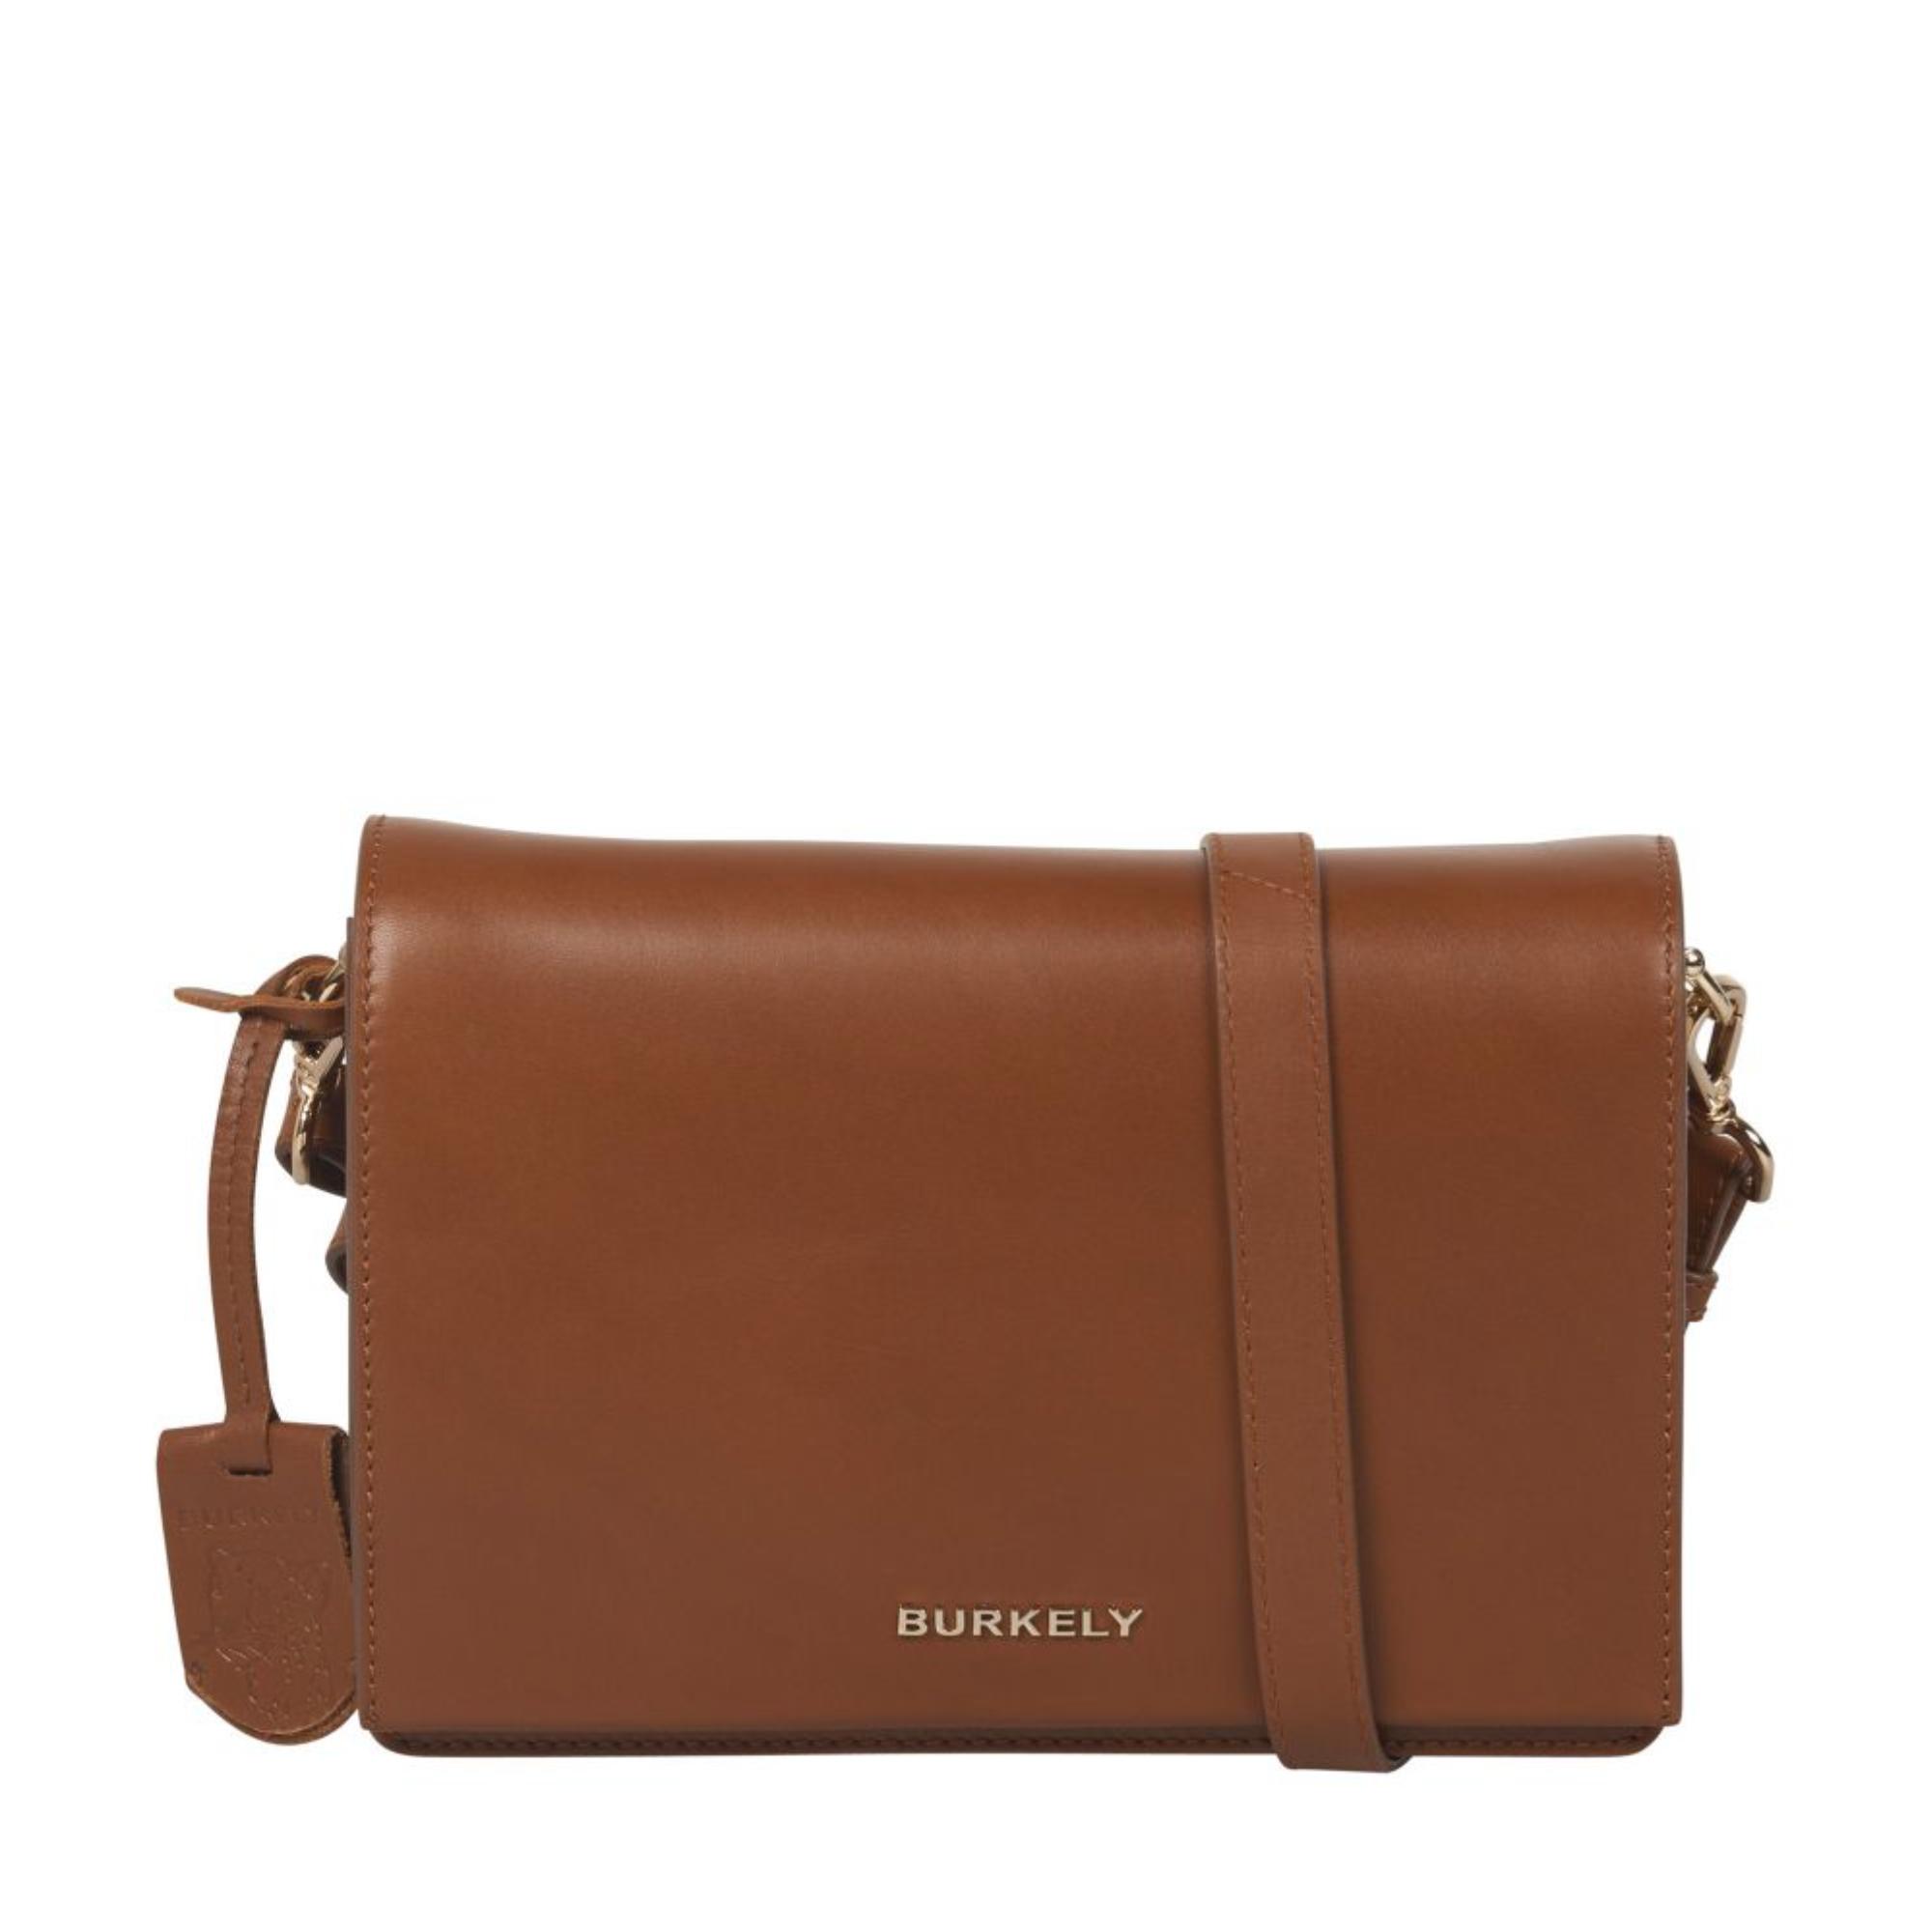 Burkely 1000155 Crossbody bag 43.24 Cognac